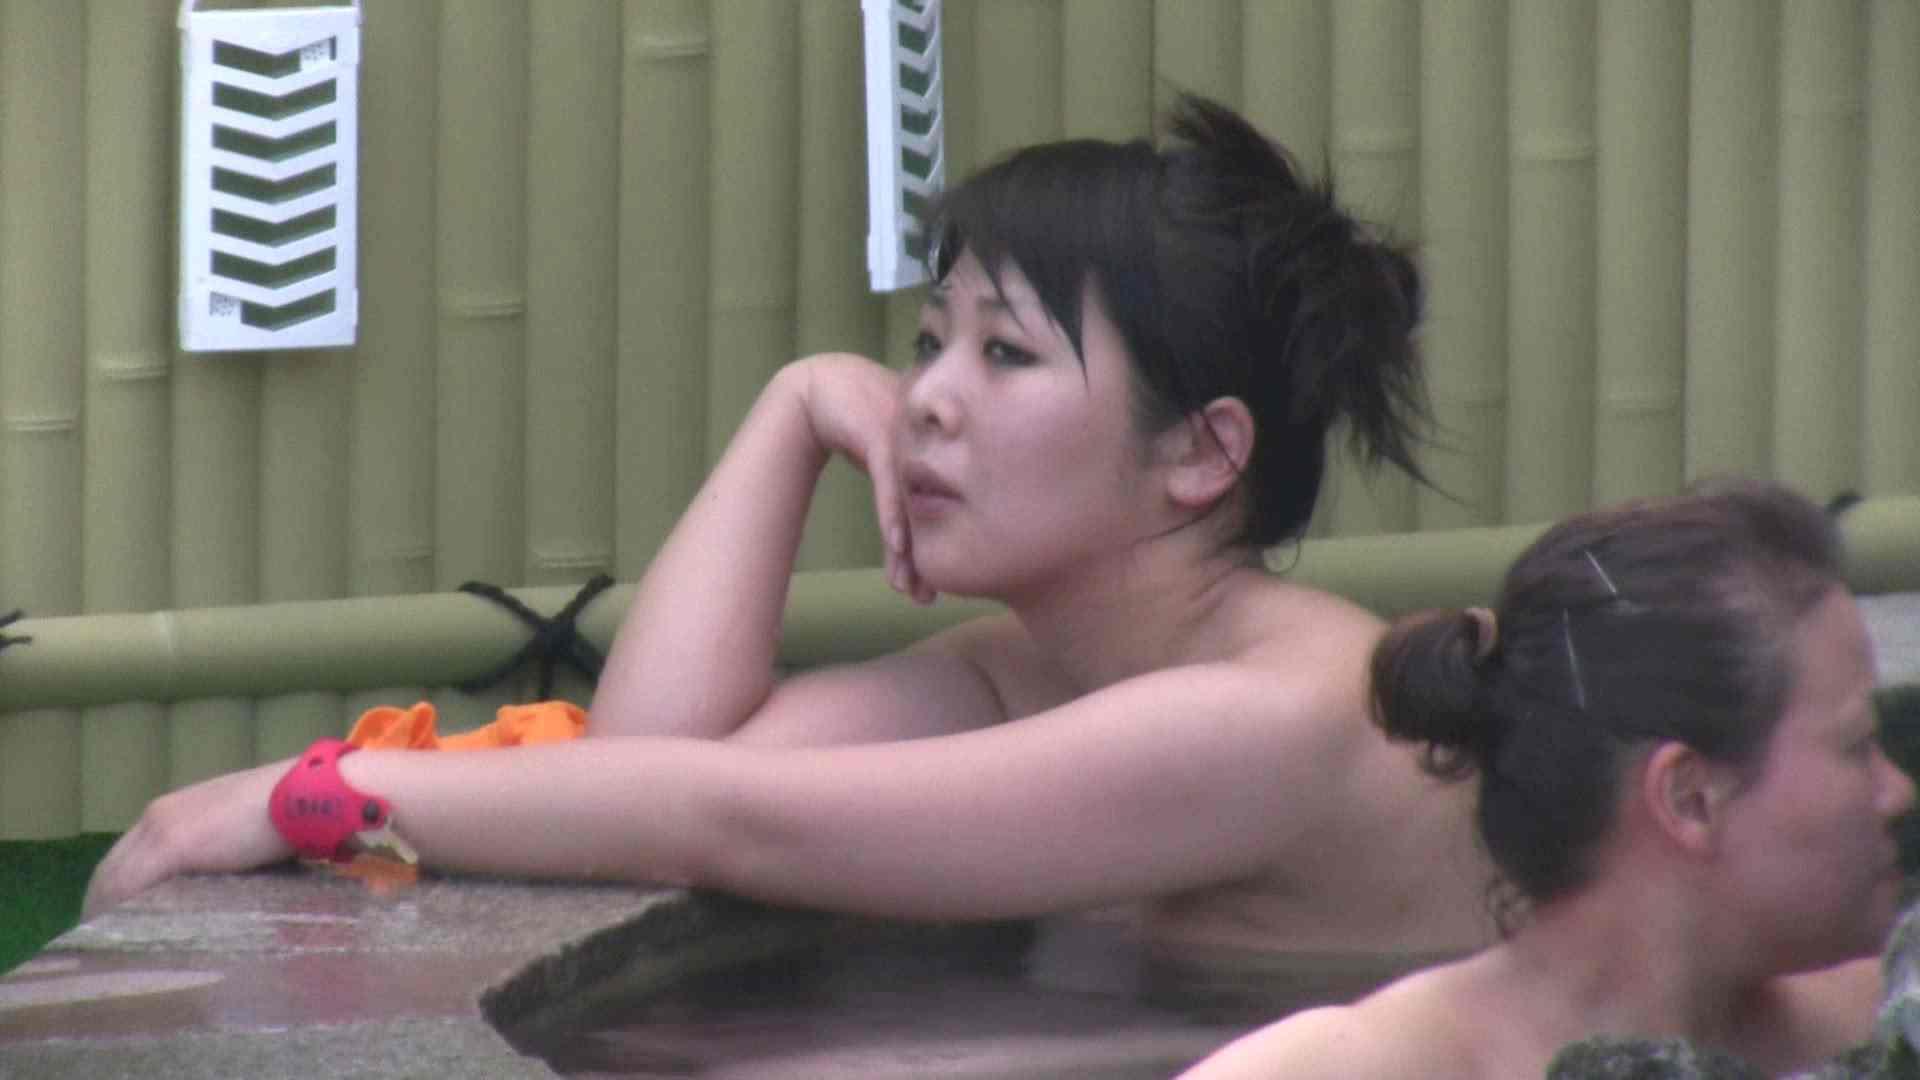 Aquaな露天風呂Vol.118 OL女体  68連発 60